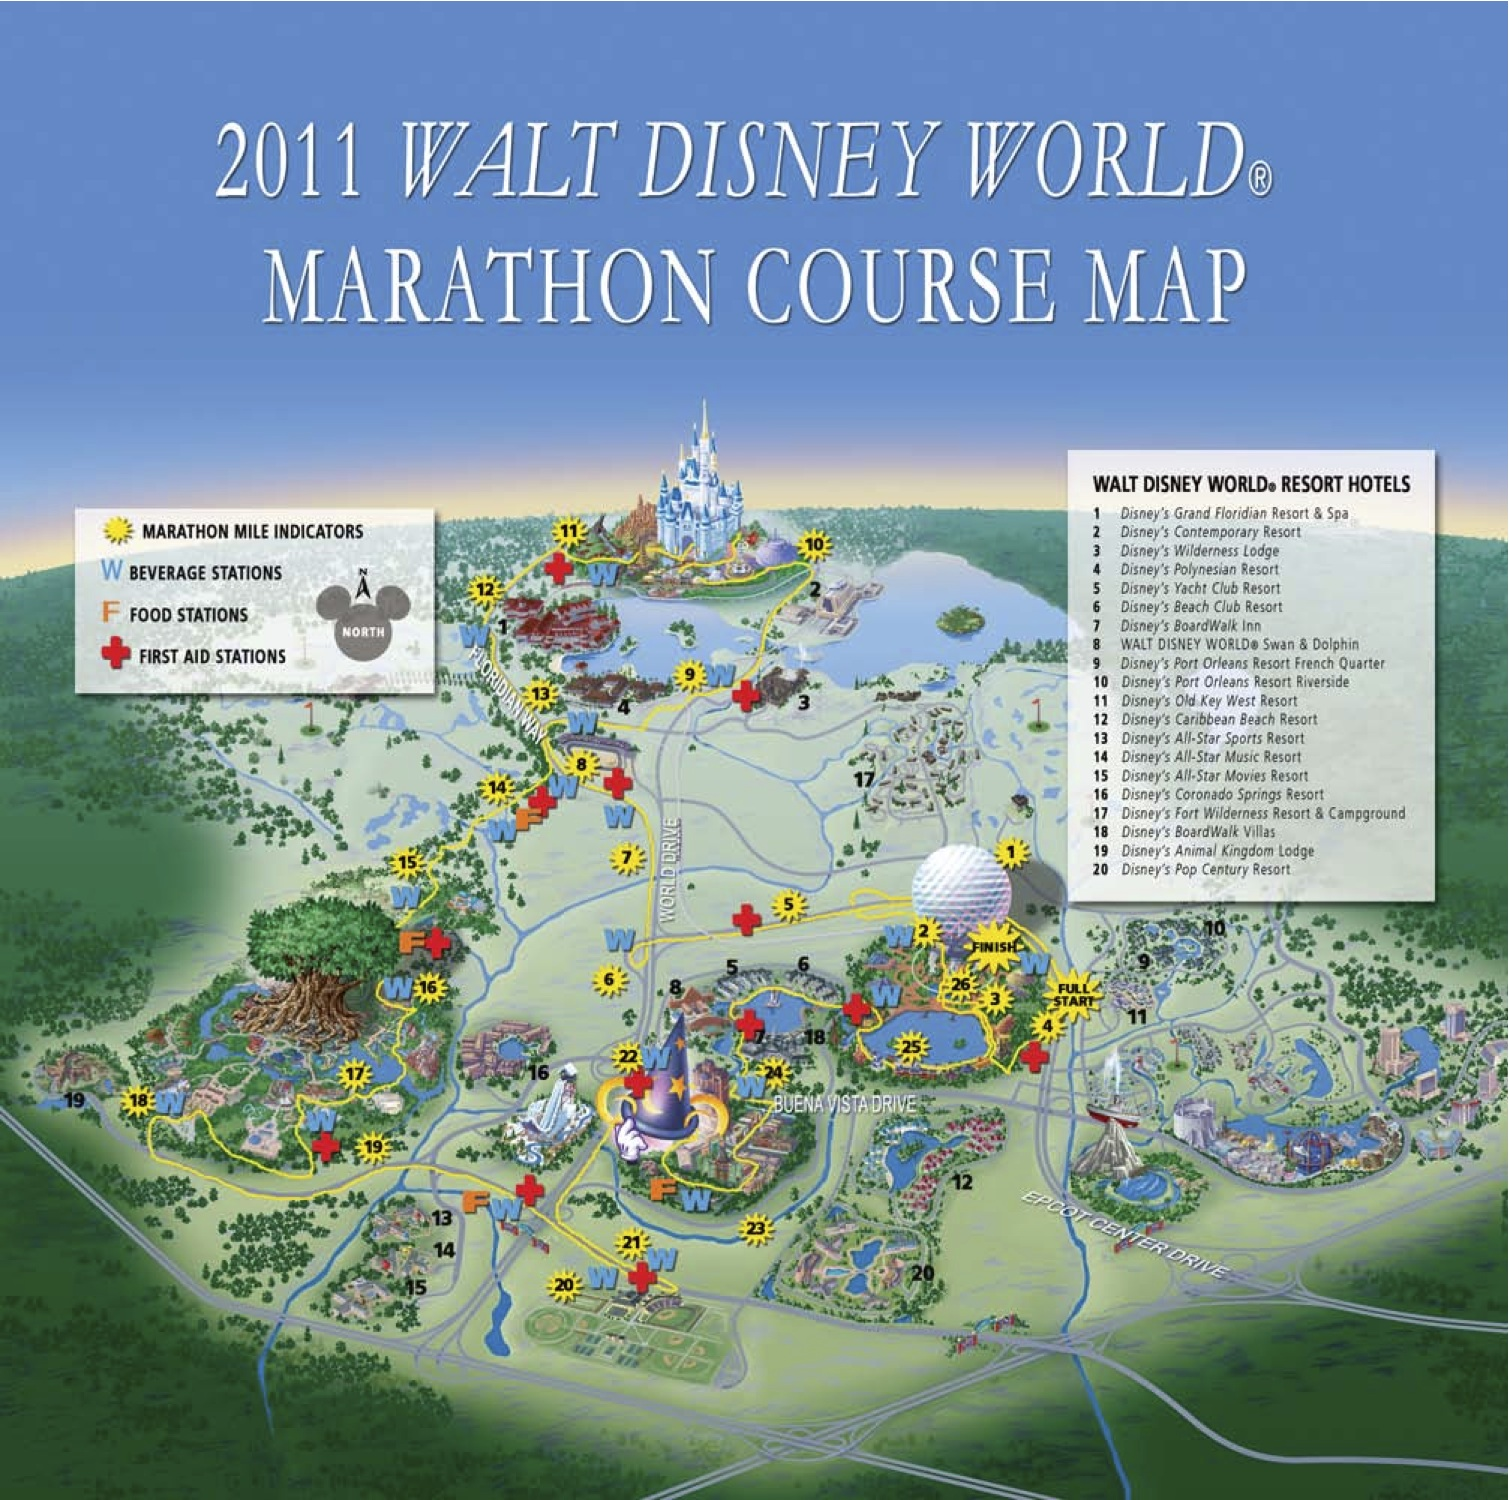 2011 WALT DISNEY WORLD® Marathon Course Map (the17thman) Disney Marathon Course Map on